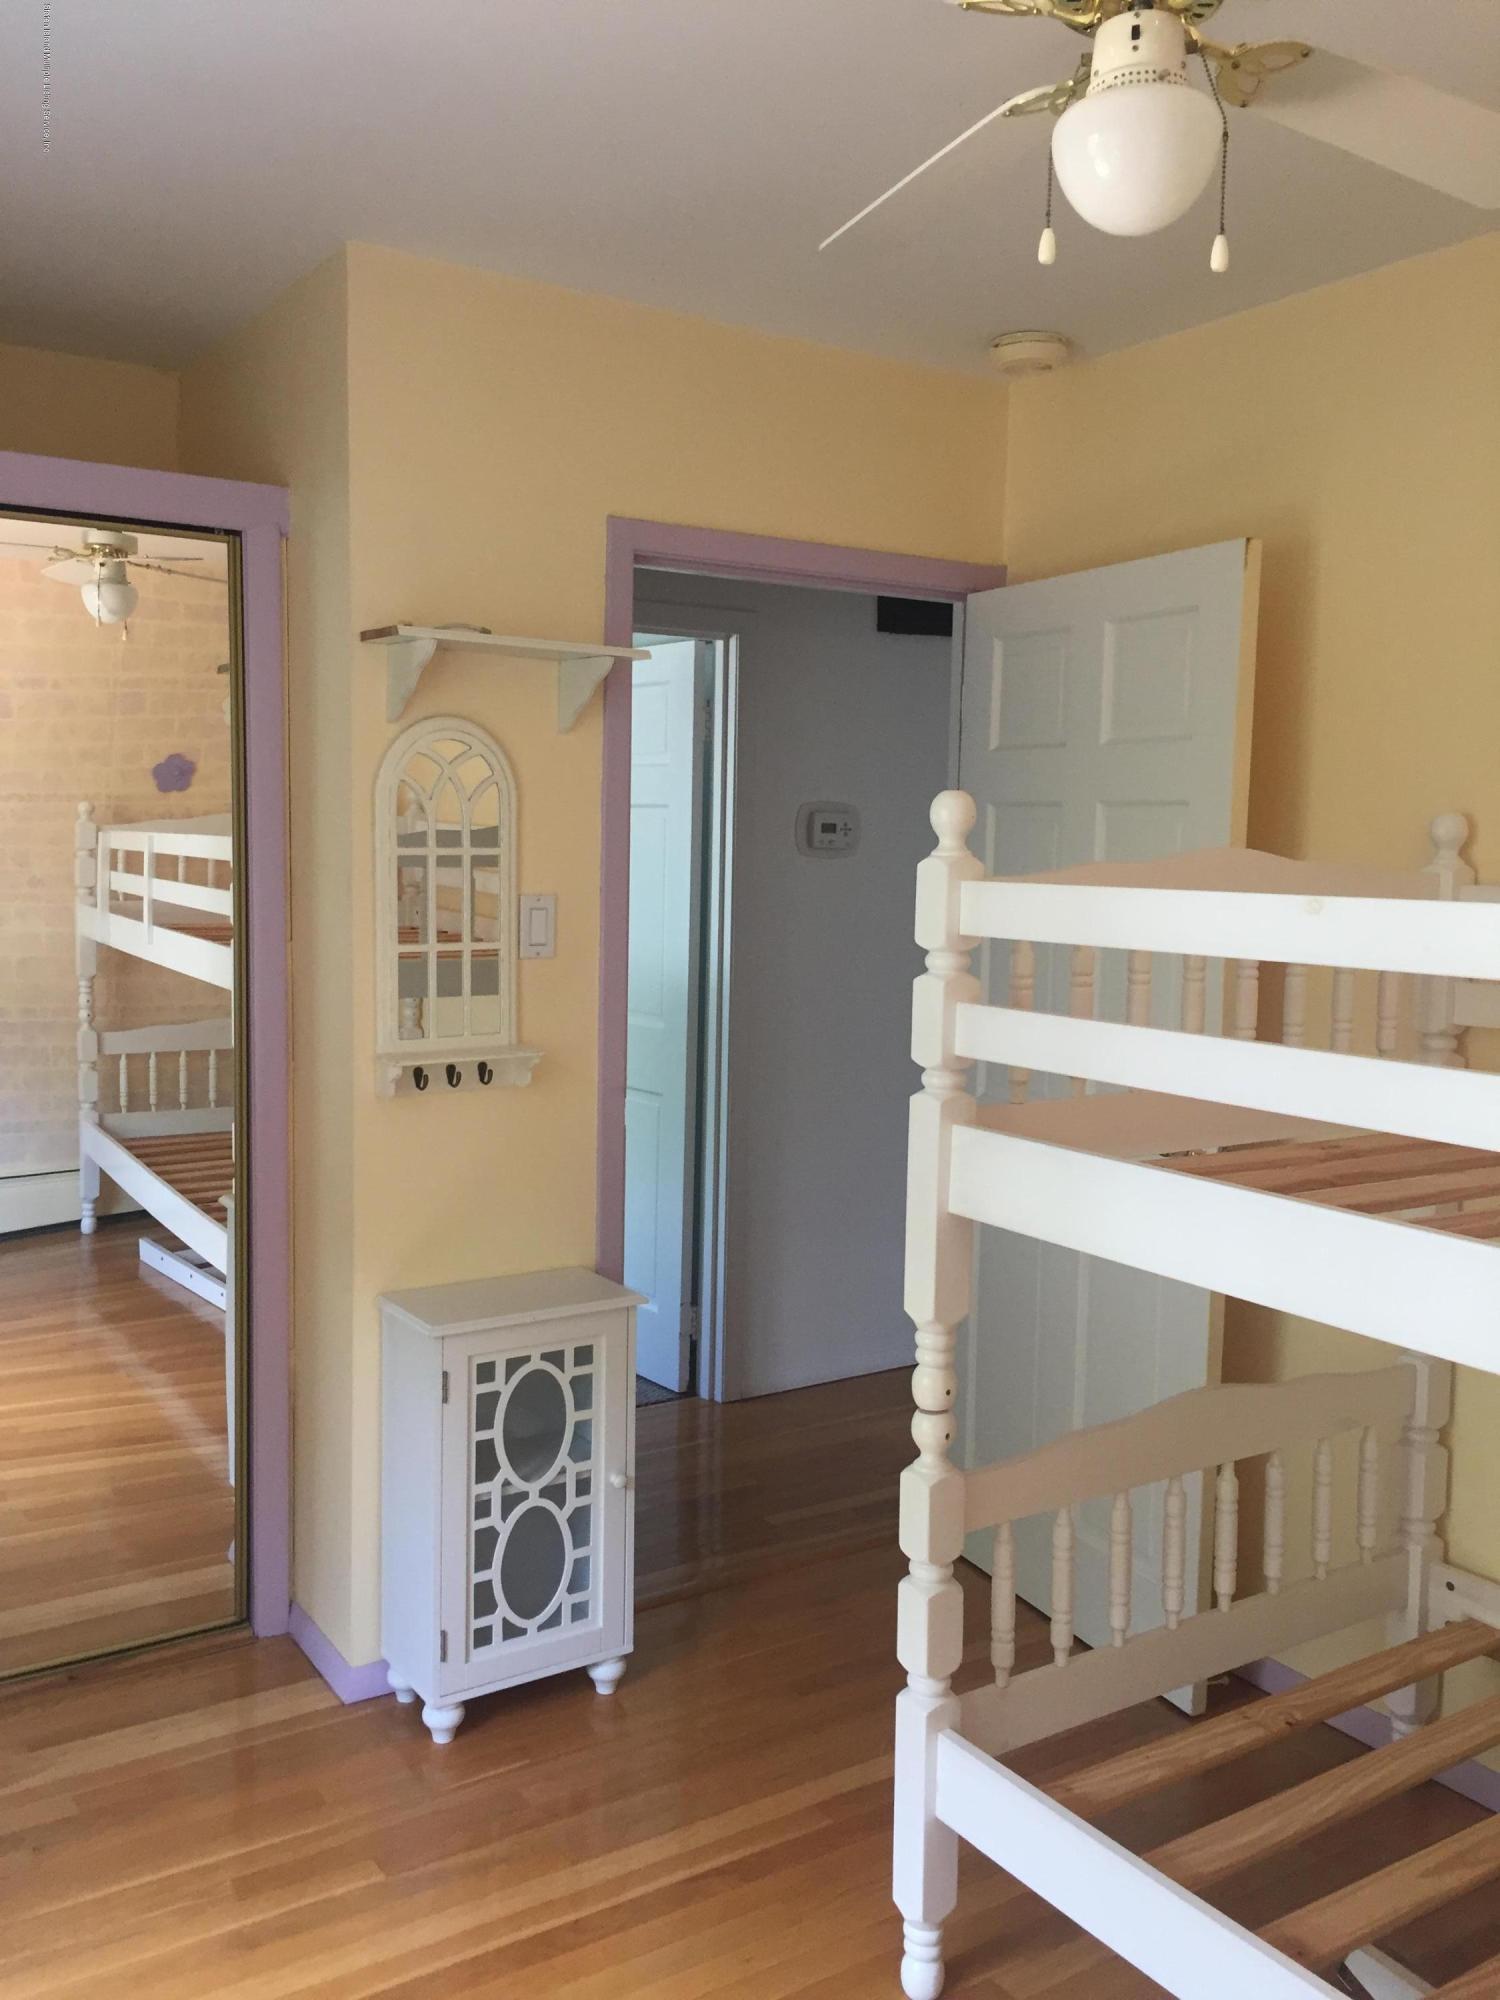 Single Family - Detached 46 Forrestal Avenue  Staten Island, NY 10312, MLS-1131922-32